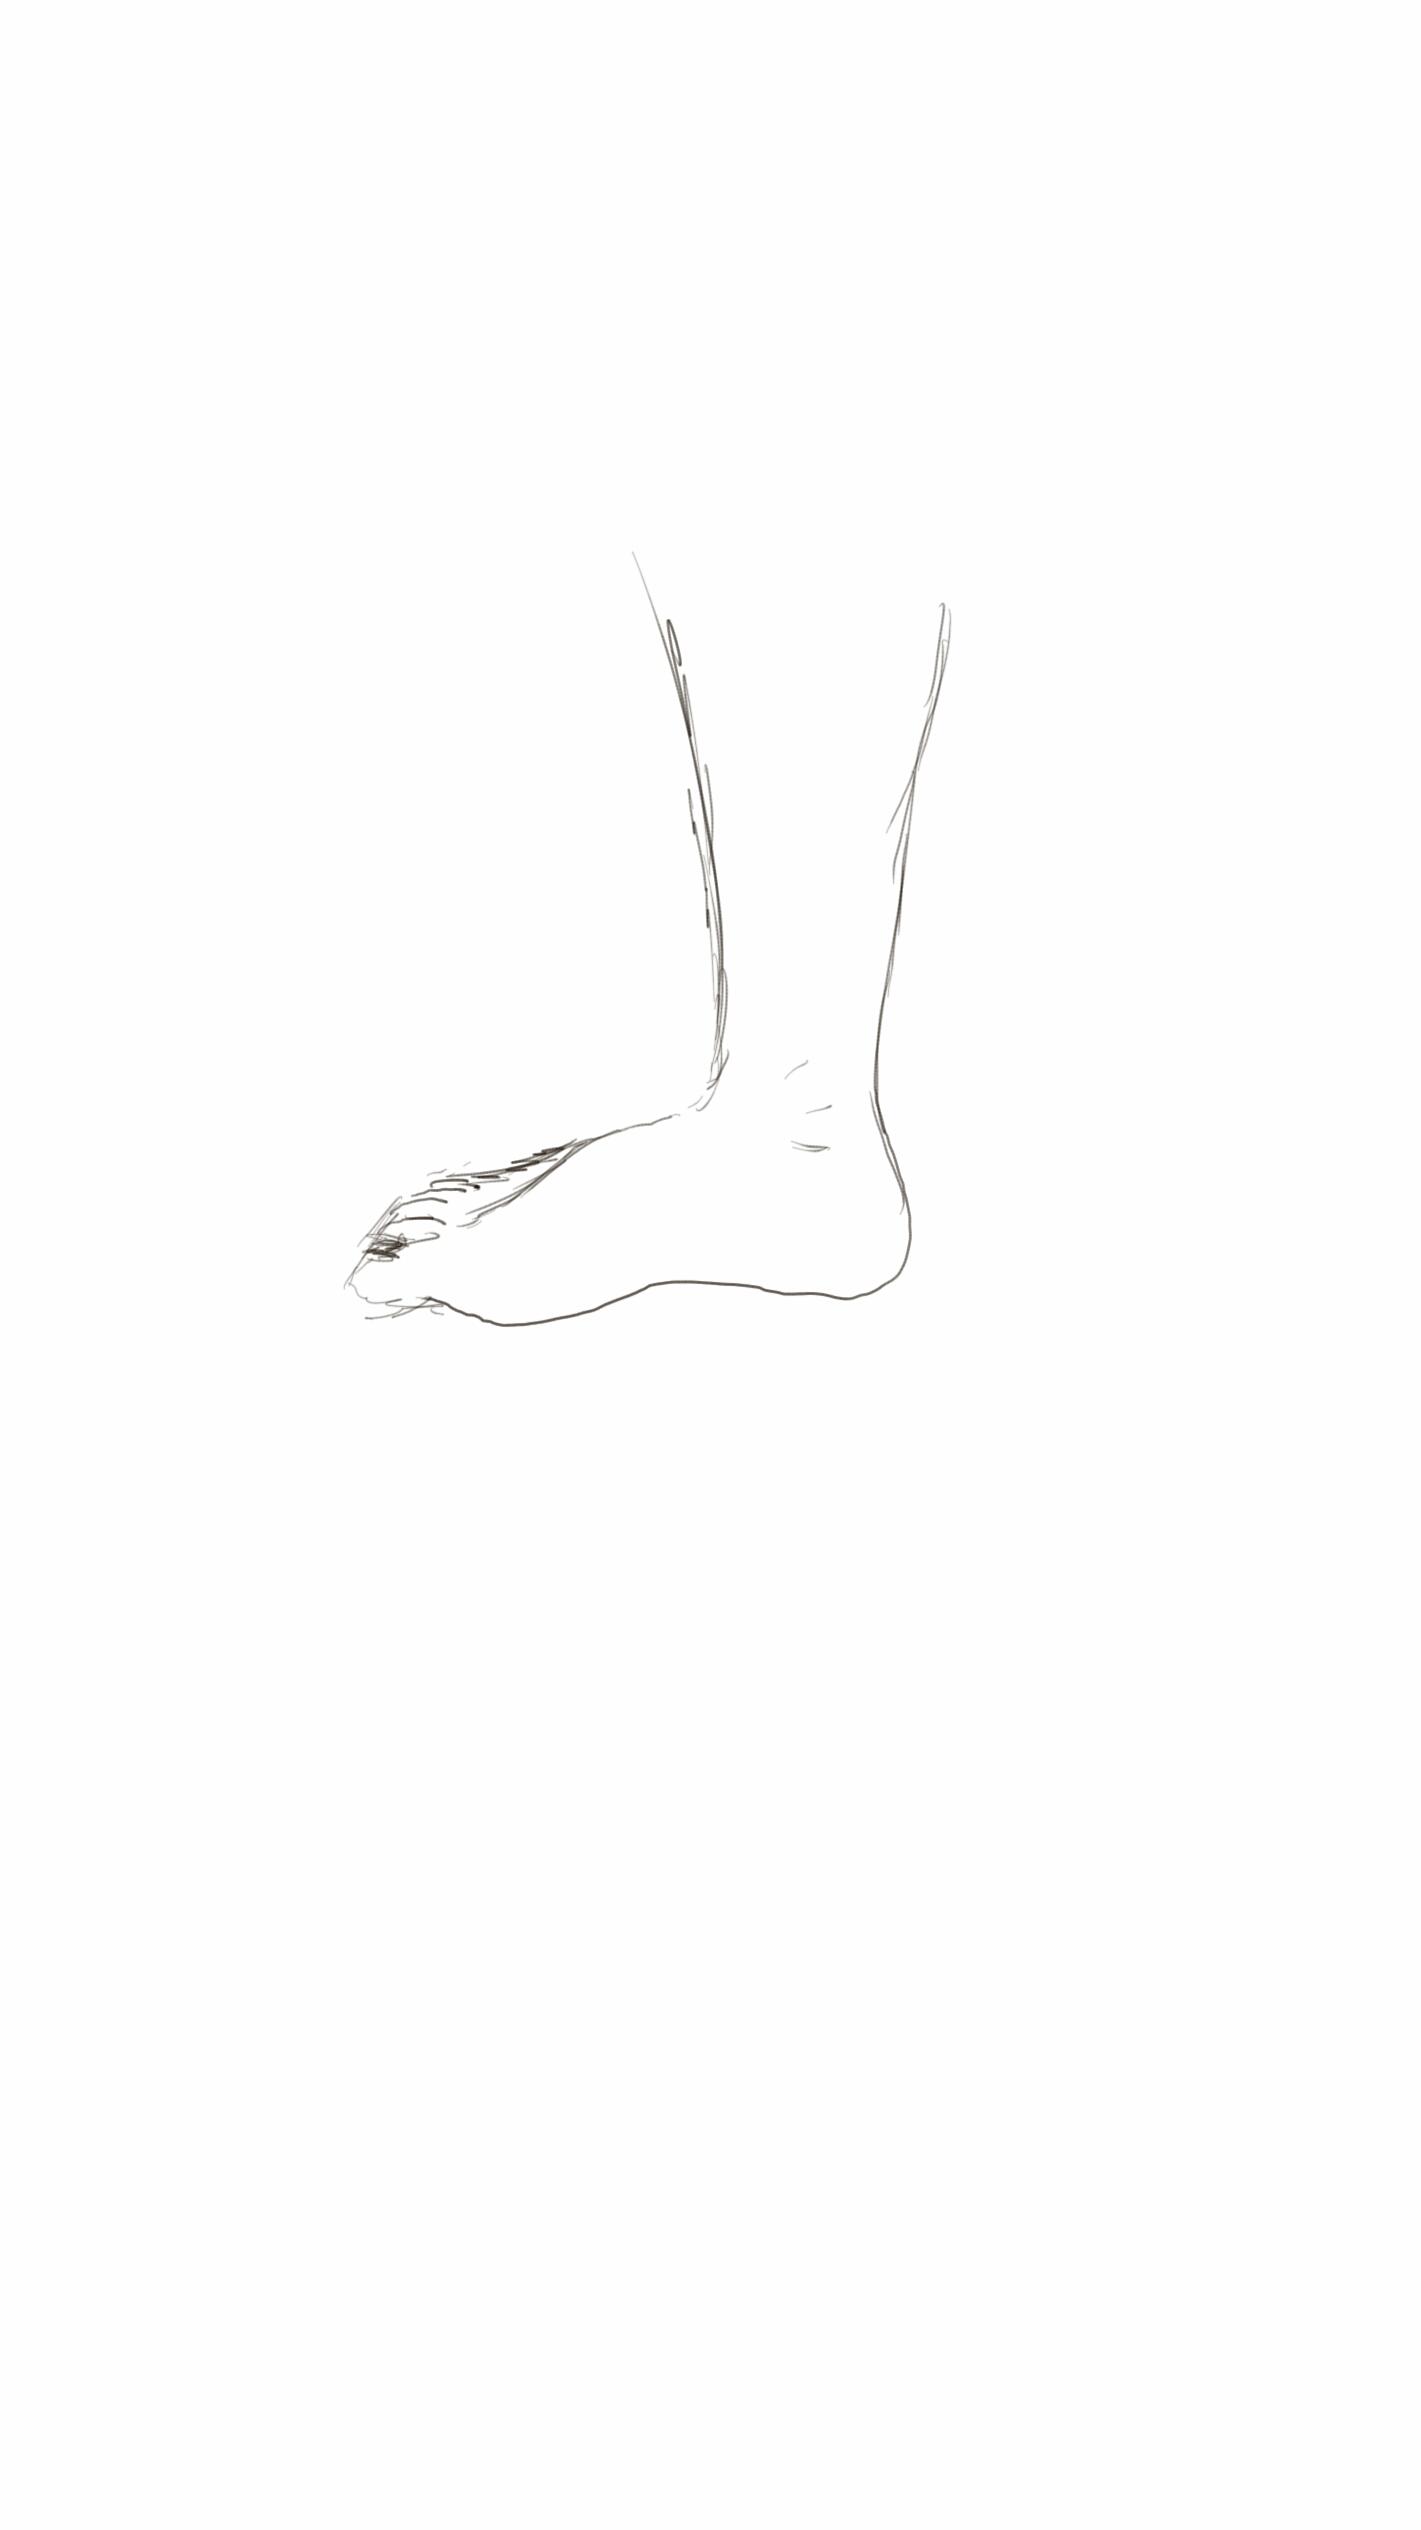 Samsung note 3  foot sketch1